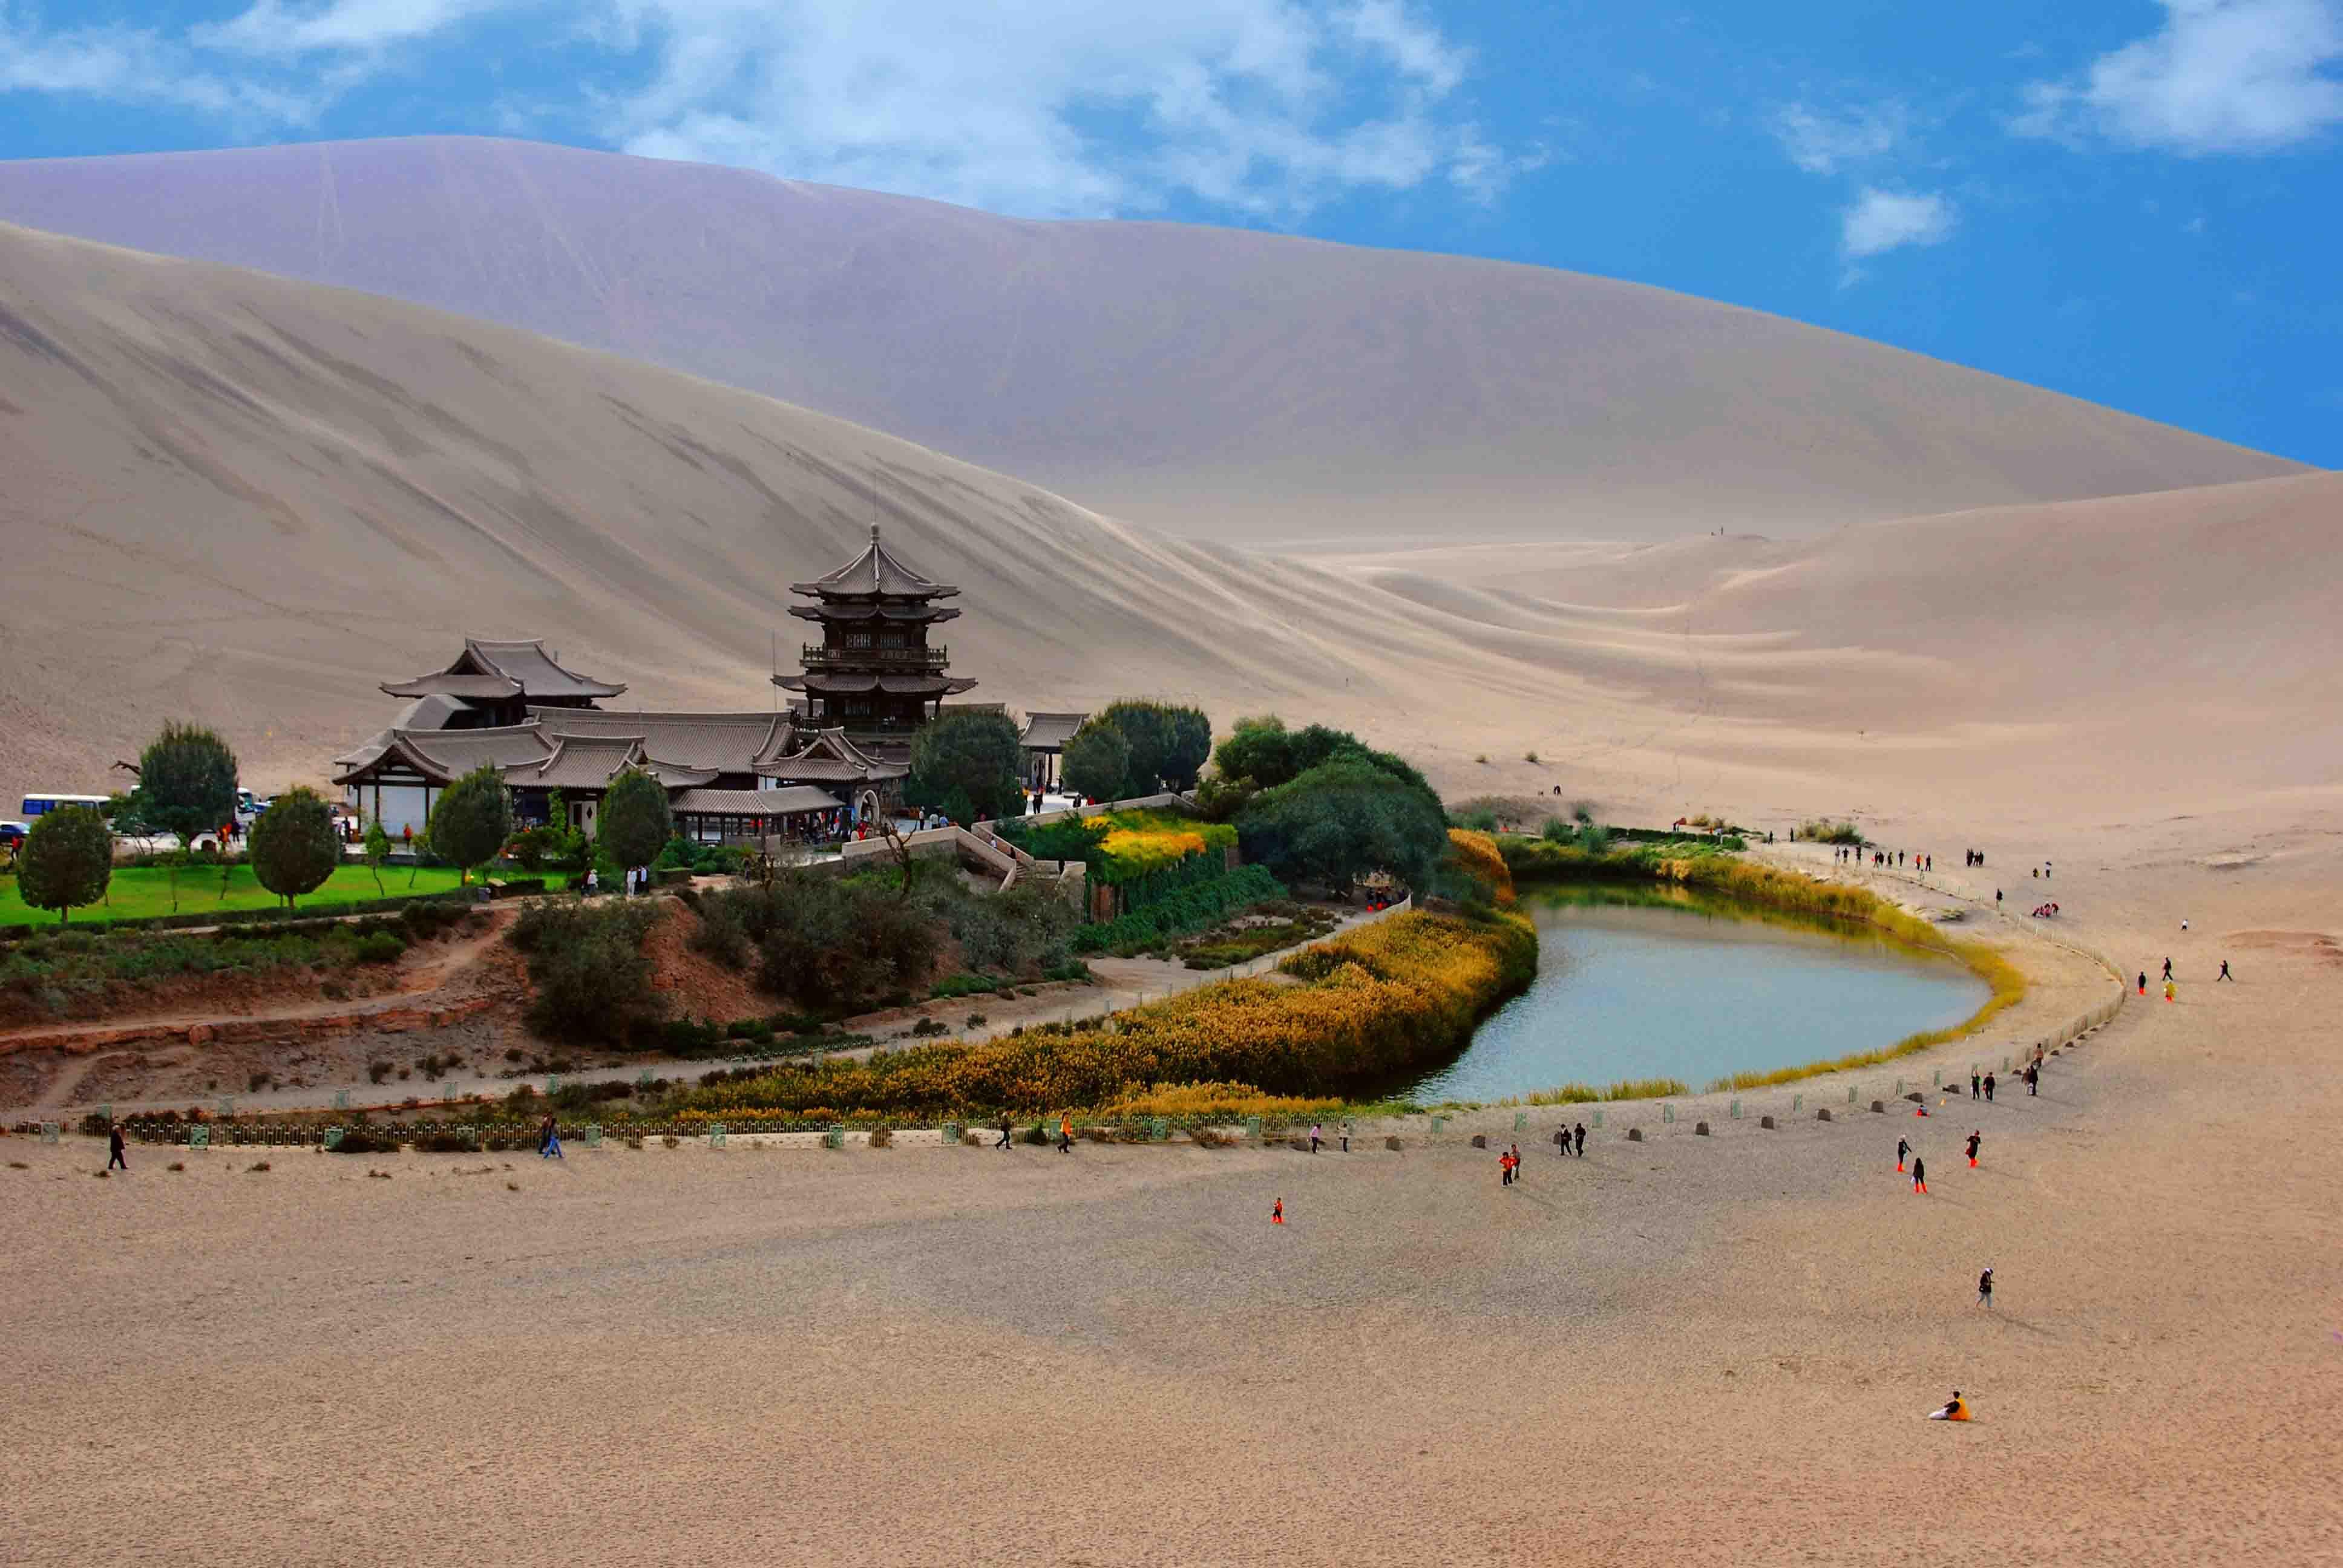 deserts of northwest china